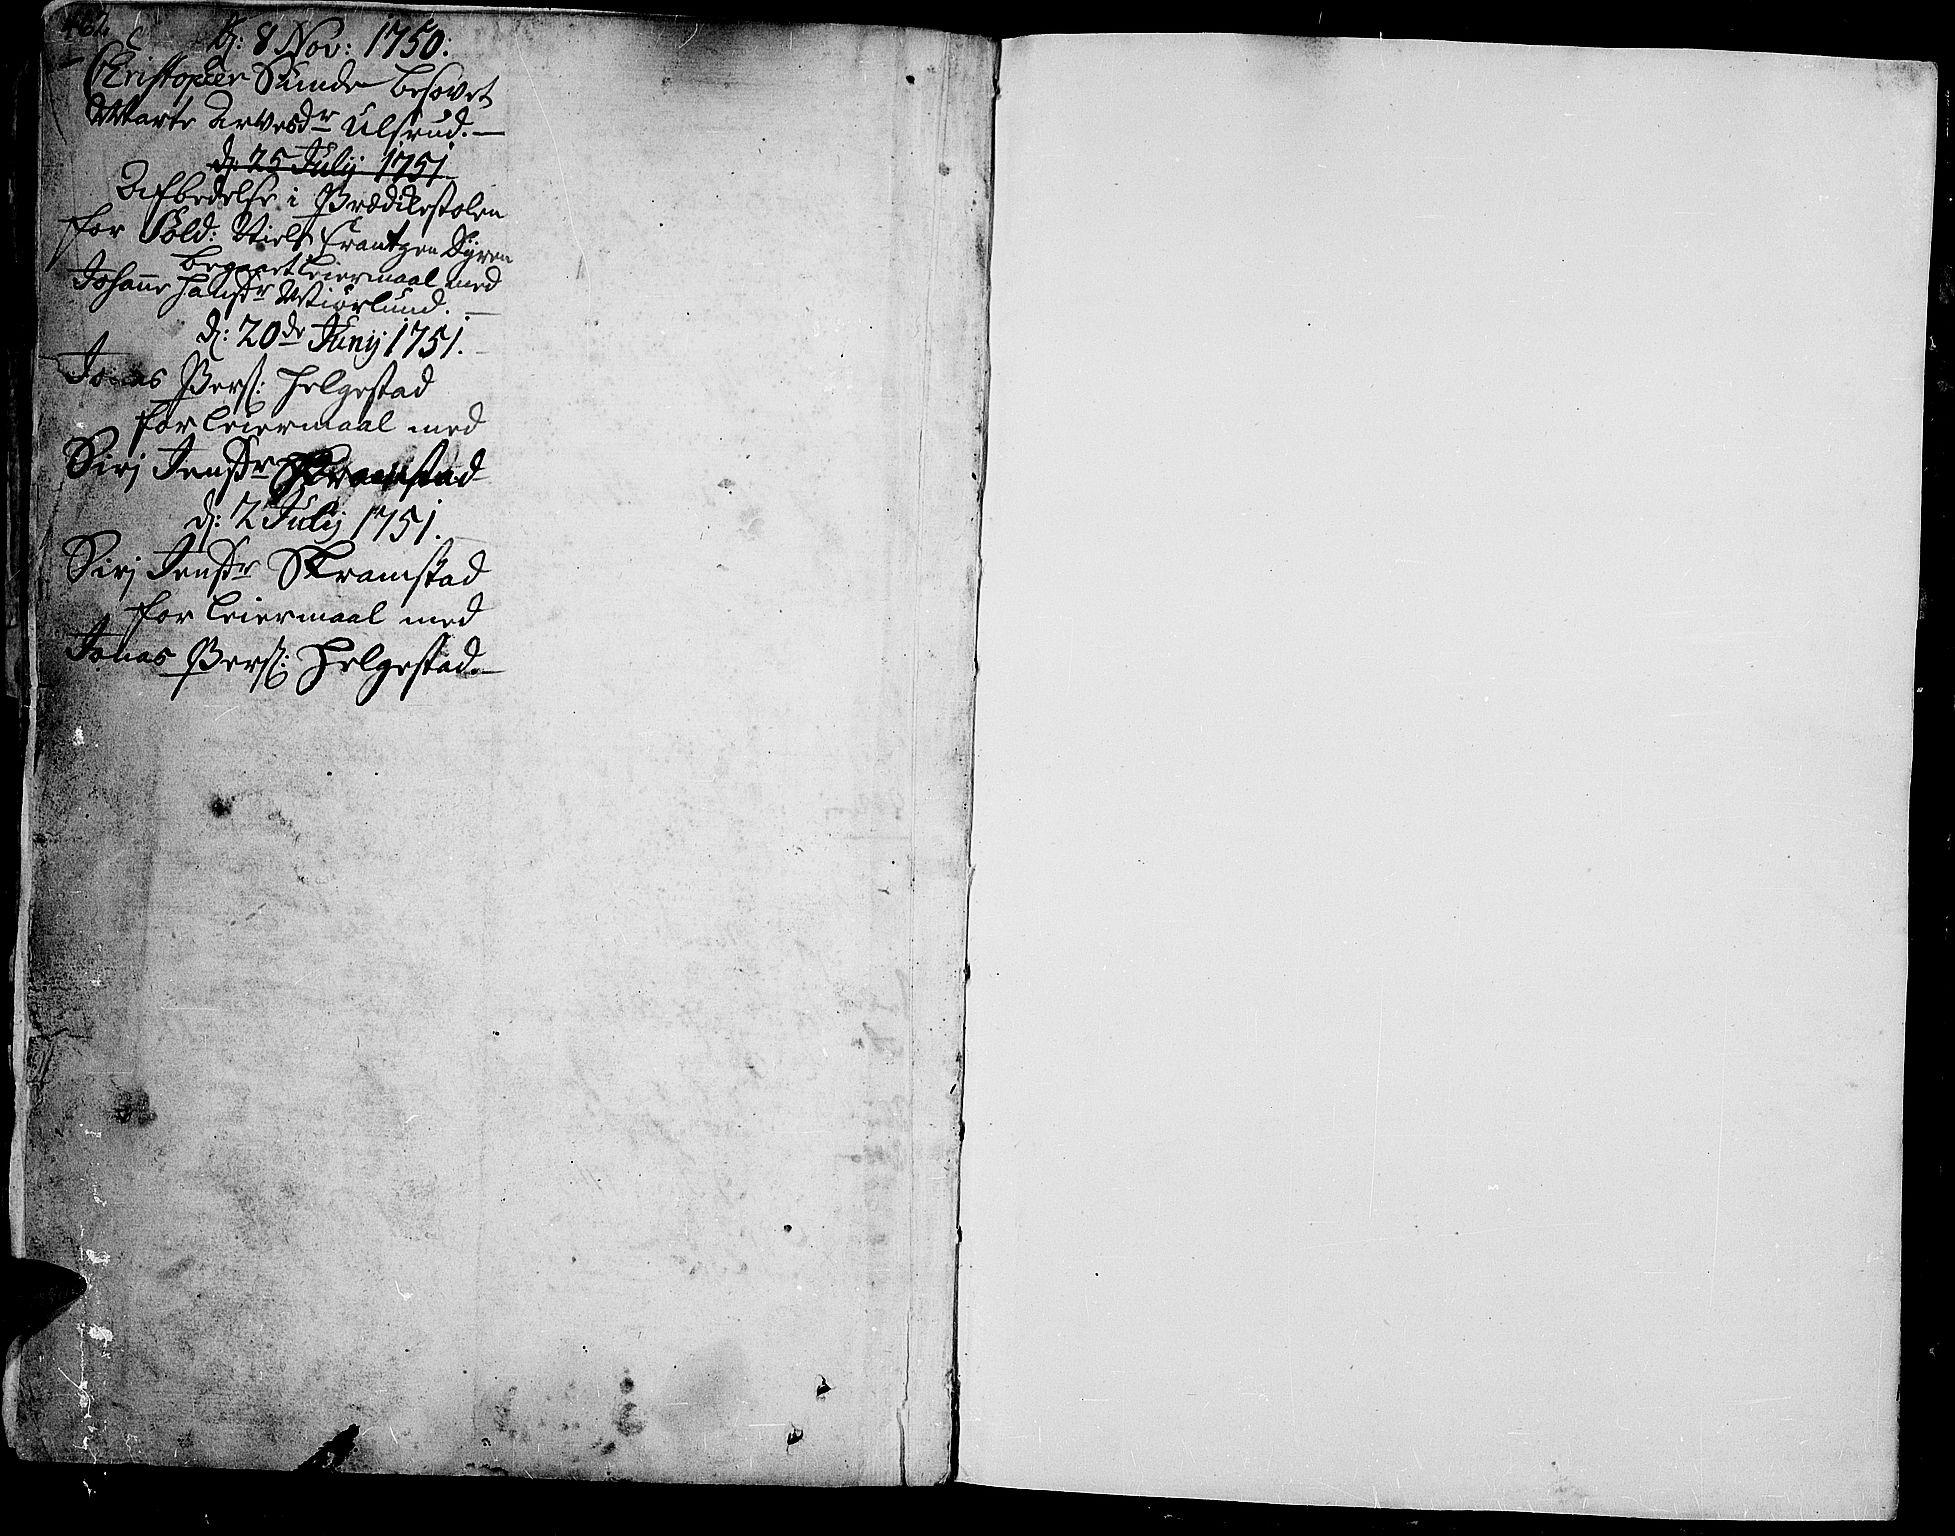 SAH, Toten prestekontor, Ministerialbok nr. 3, 1734-1751, s. 462-463